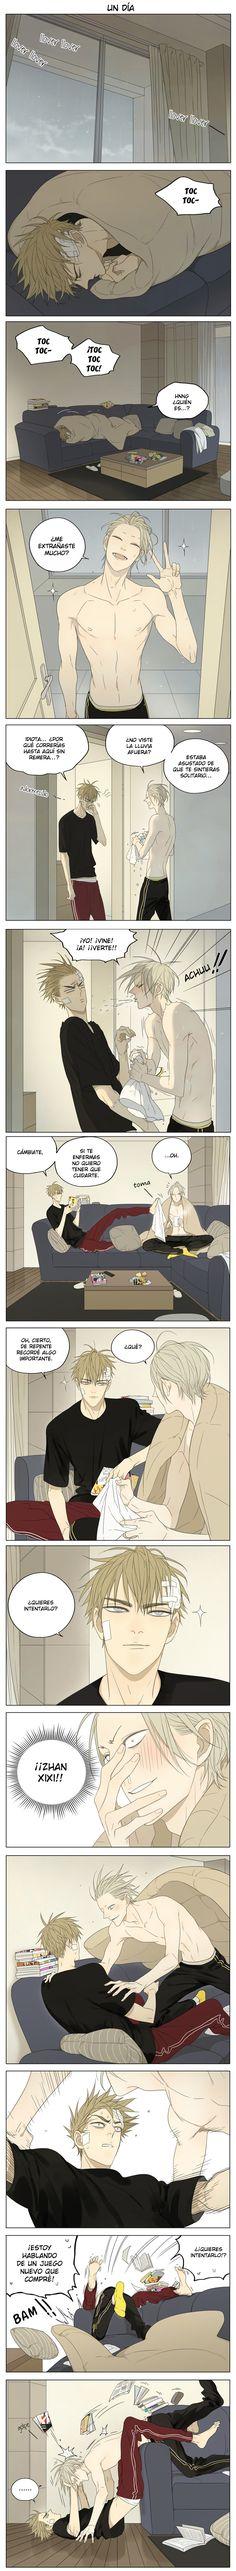 19 Days Capítulo 10 página 1 (Cargar imágenes: 10) - Leer Manga en Español gratis en NineManga.com